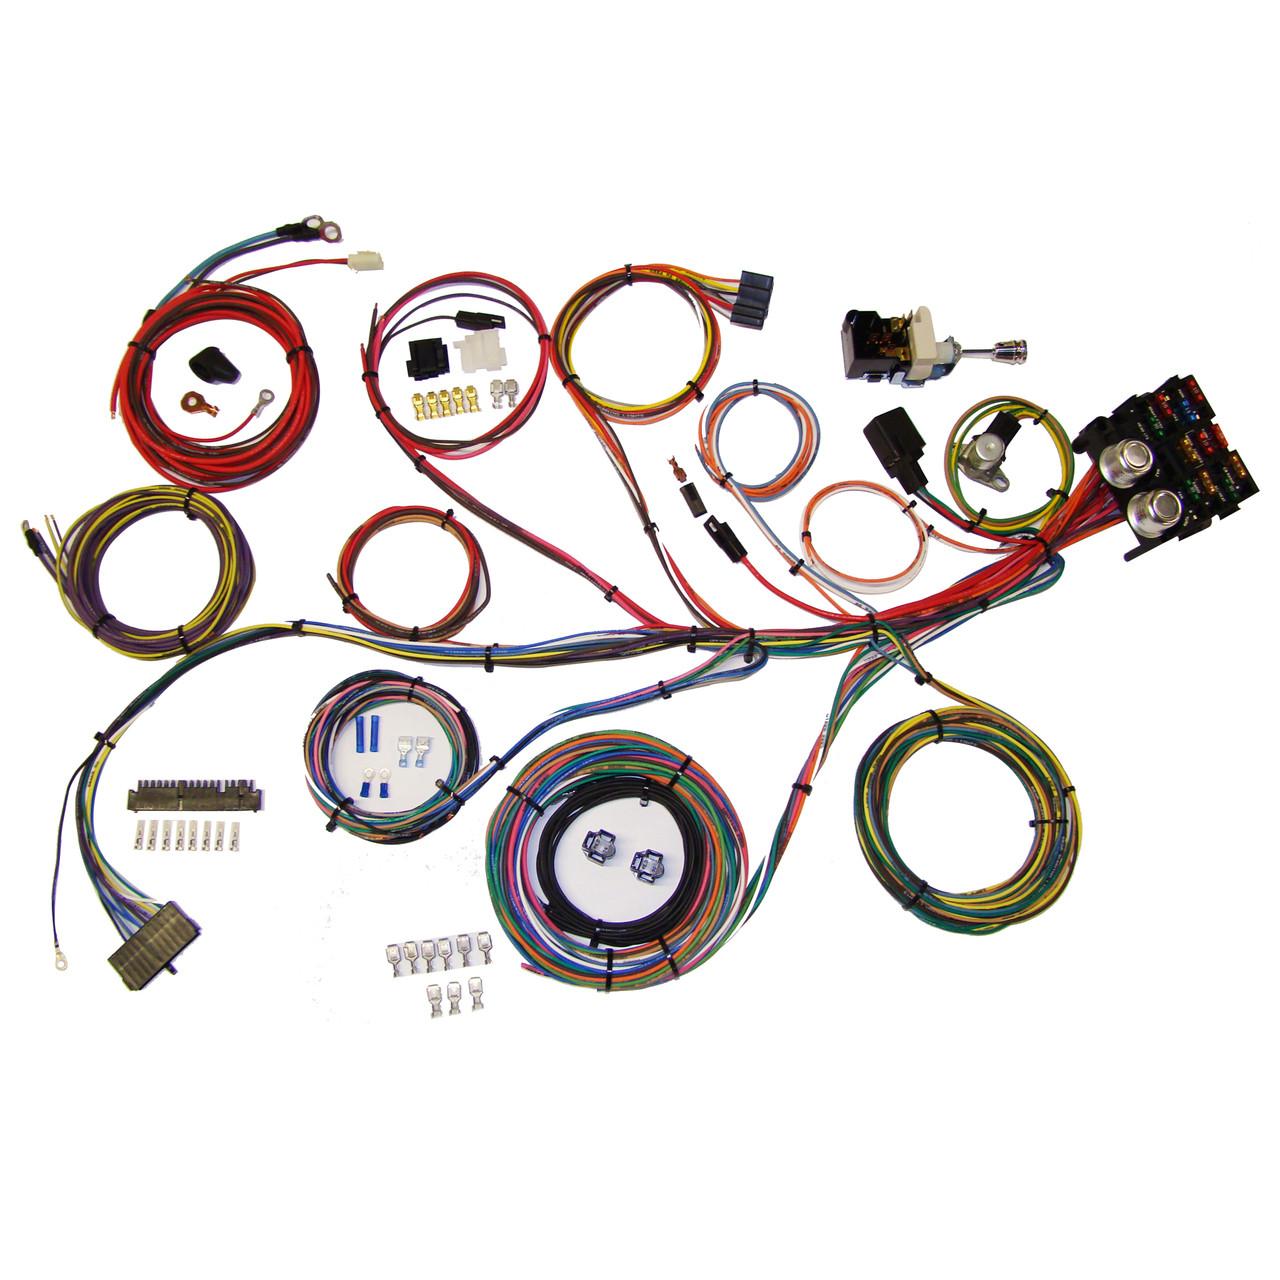 medium resolution of autowire builder 19 kit 510006 street rod hot universal wiring autowire builder 19 kit 510006 street rod hot universal wiring harness